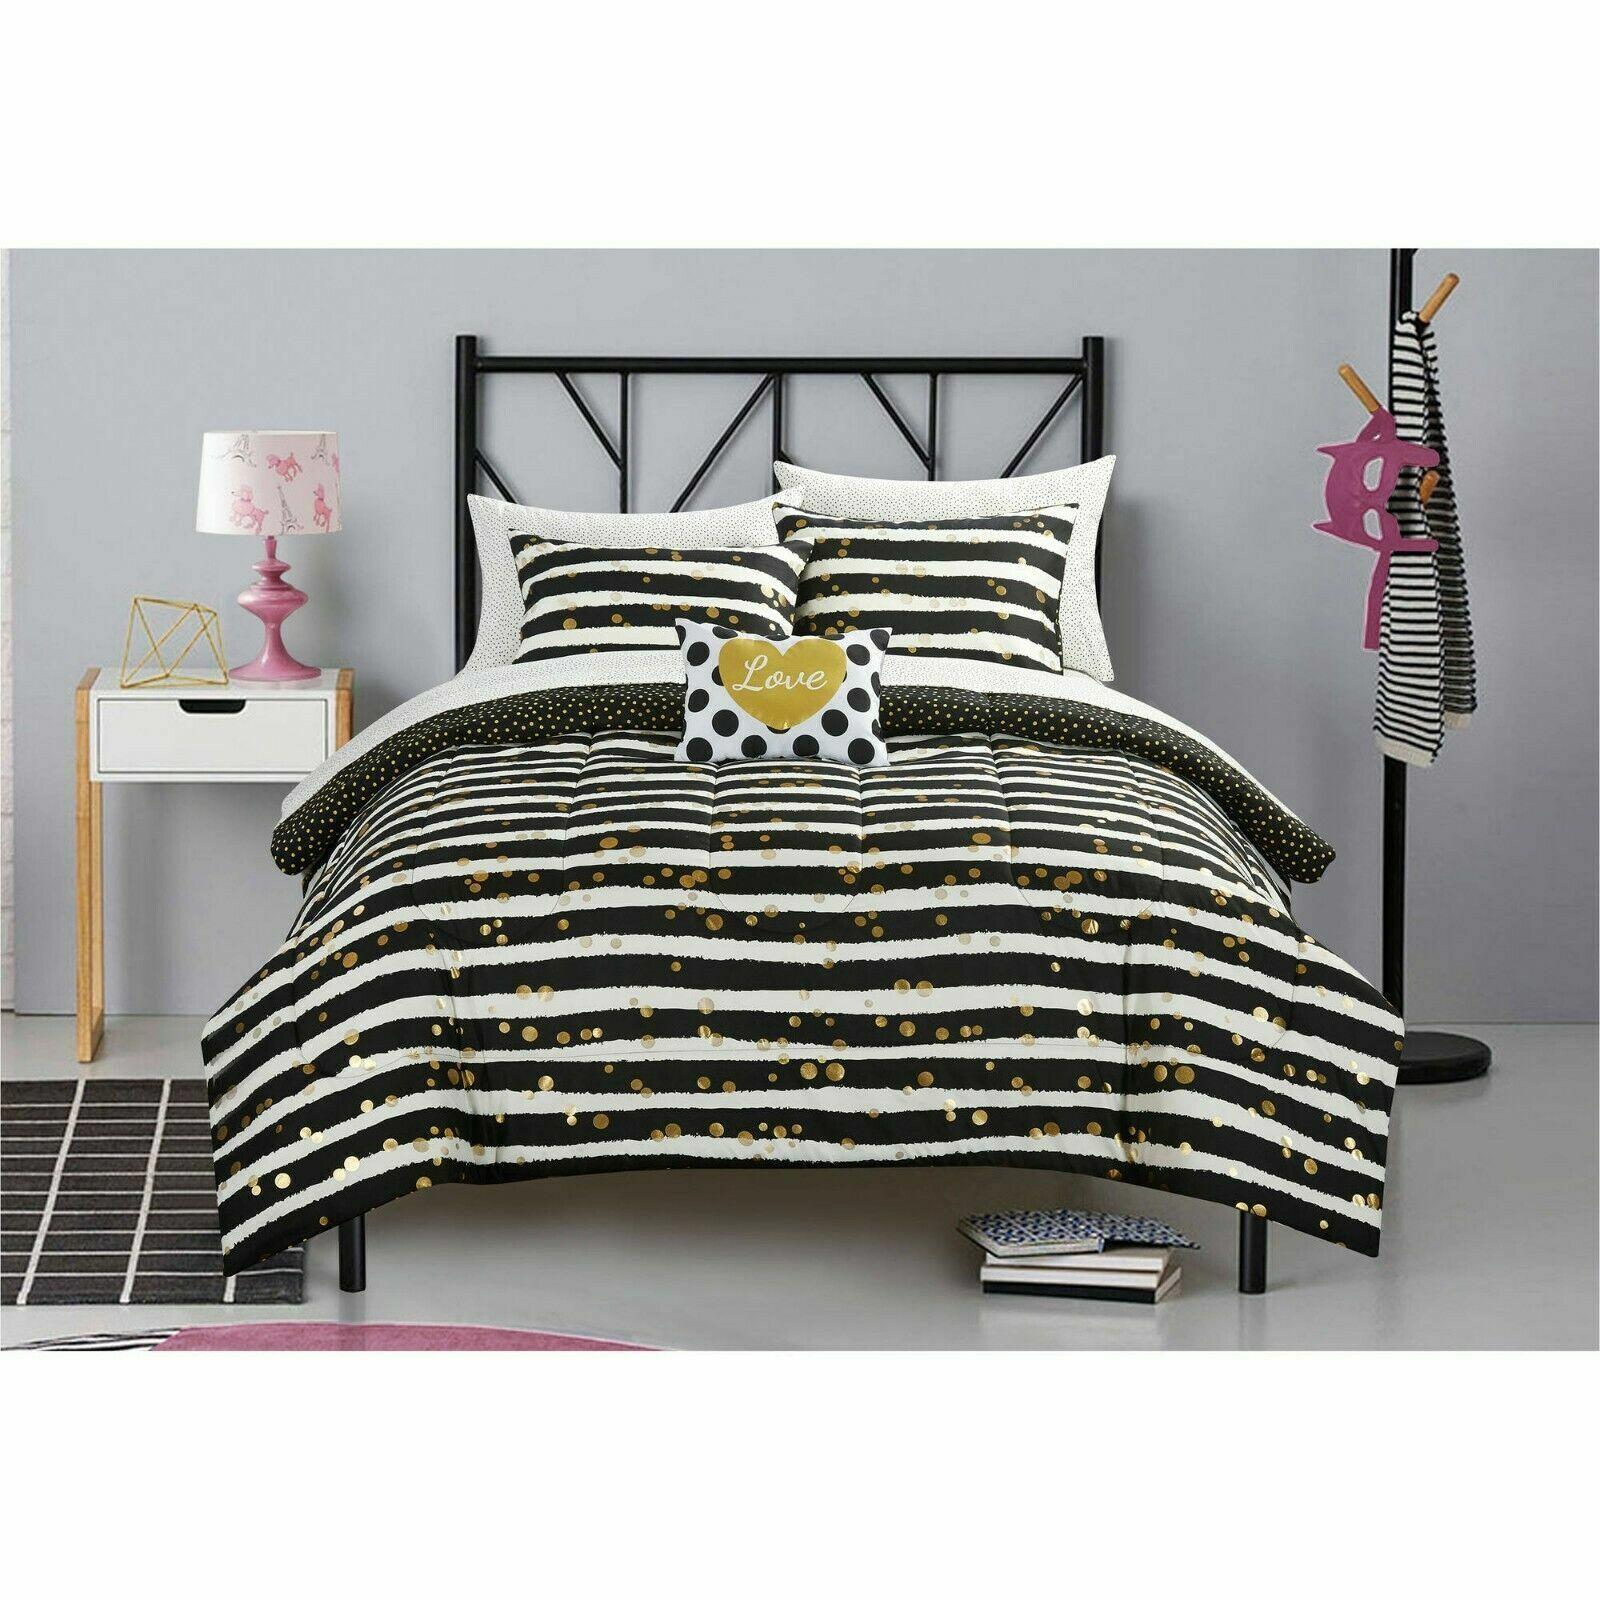 gold black white comforter set sheet set love design girls 7pc bedding queen